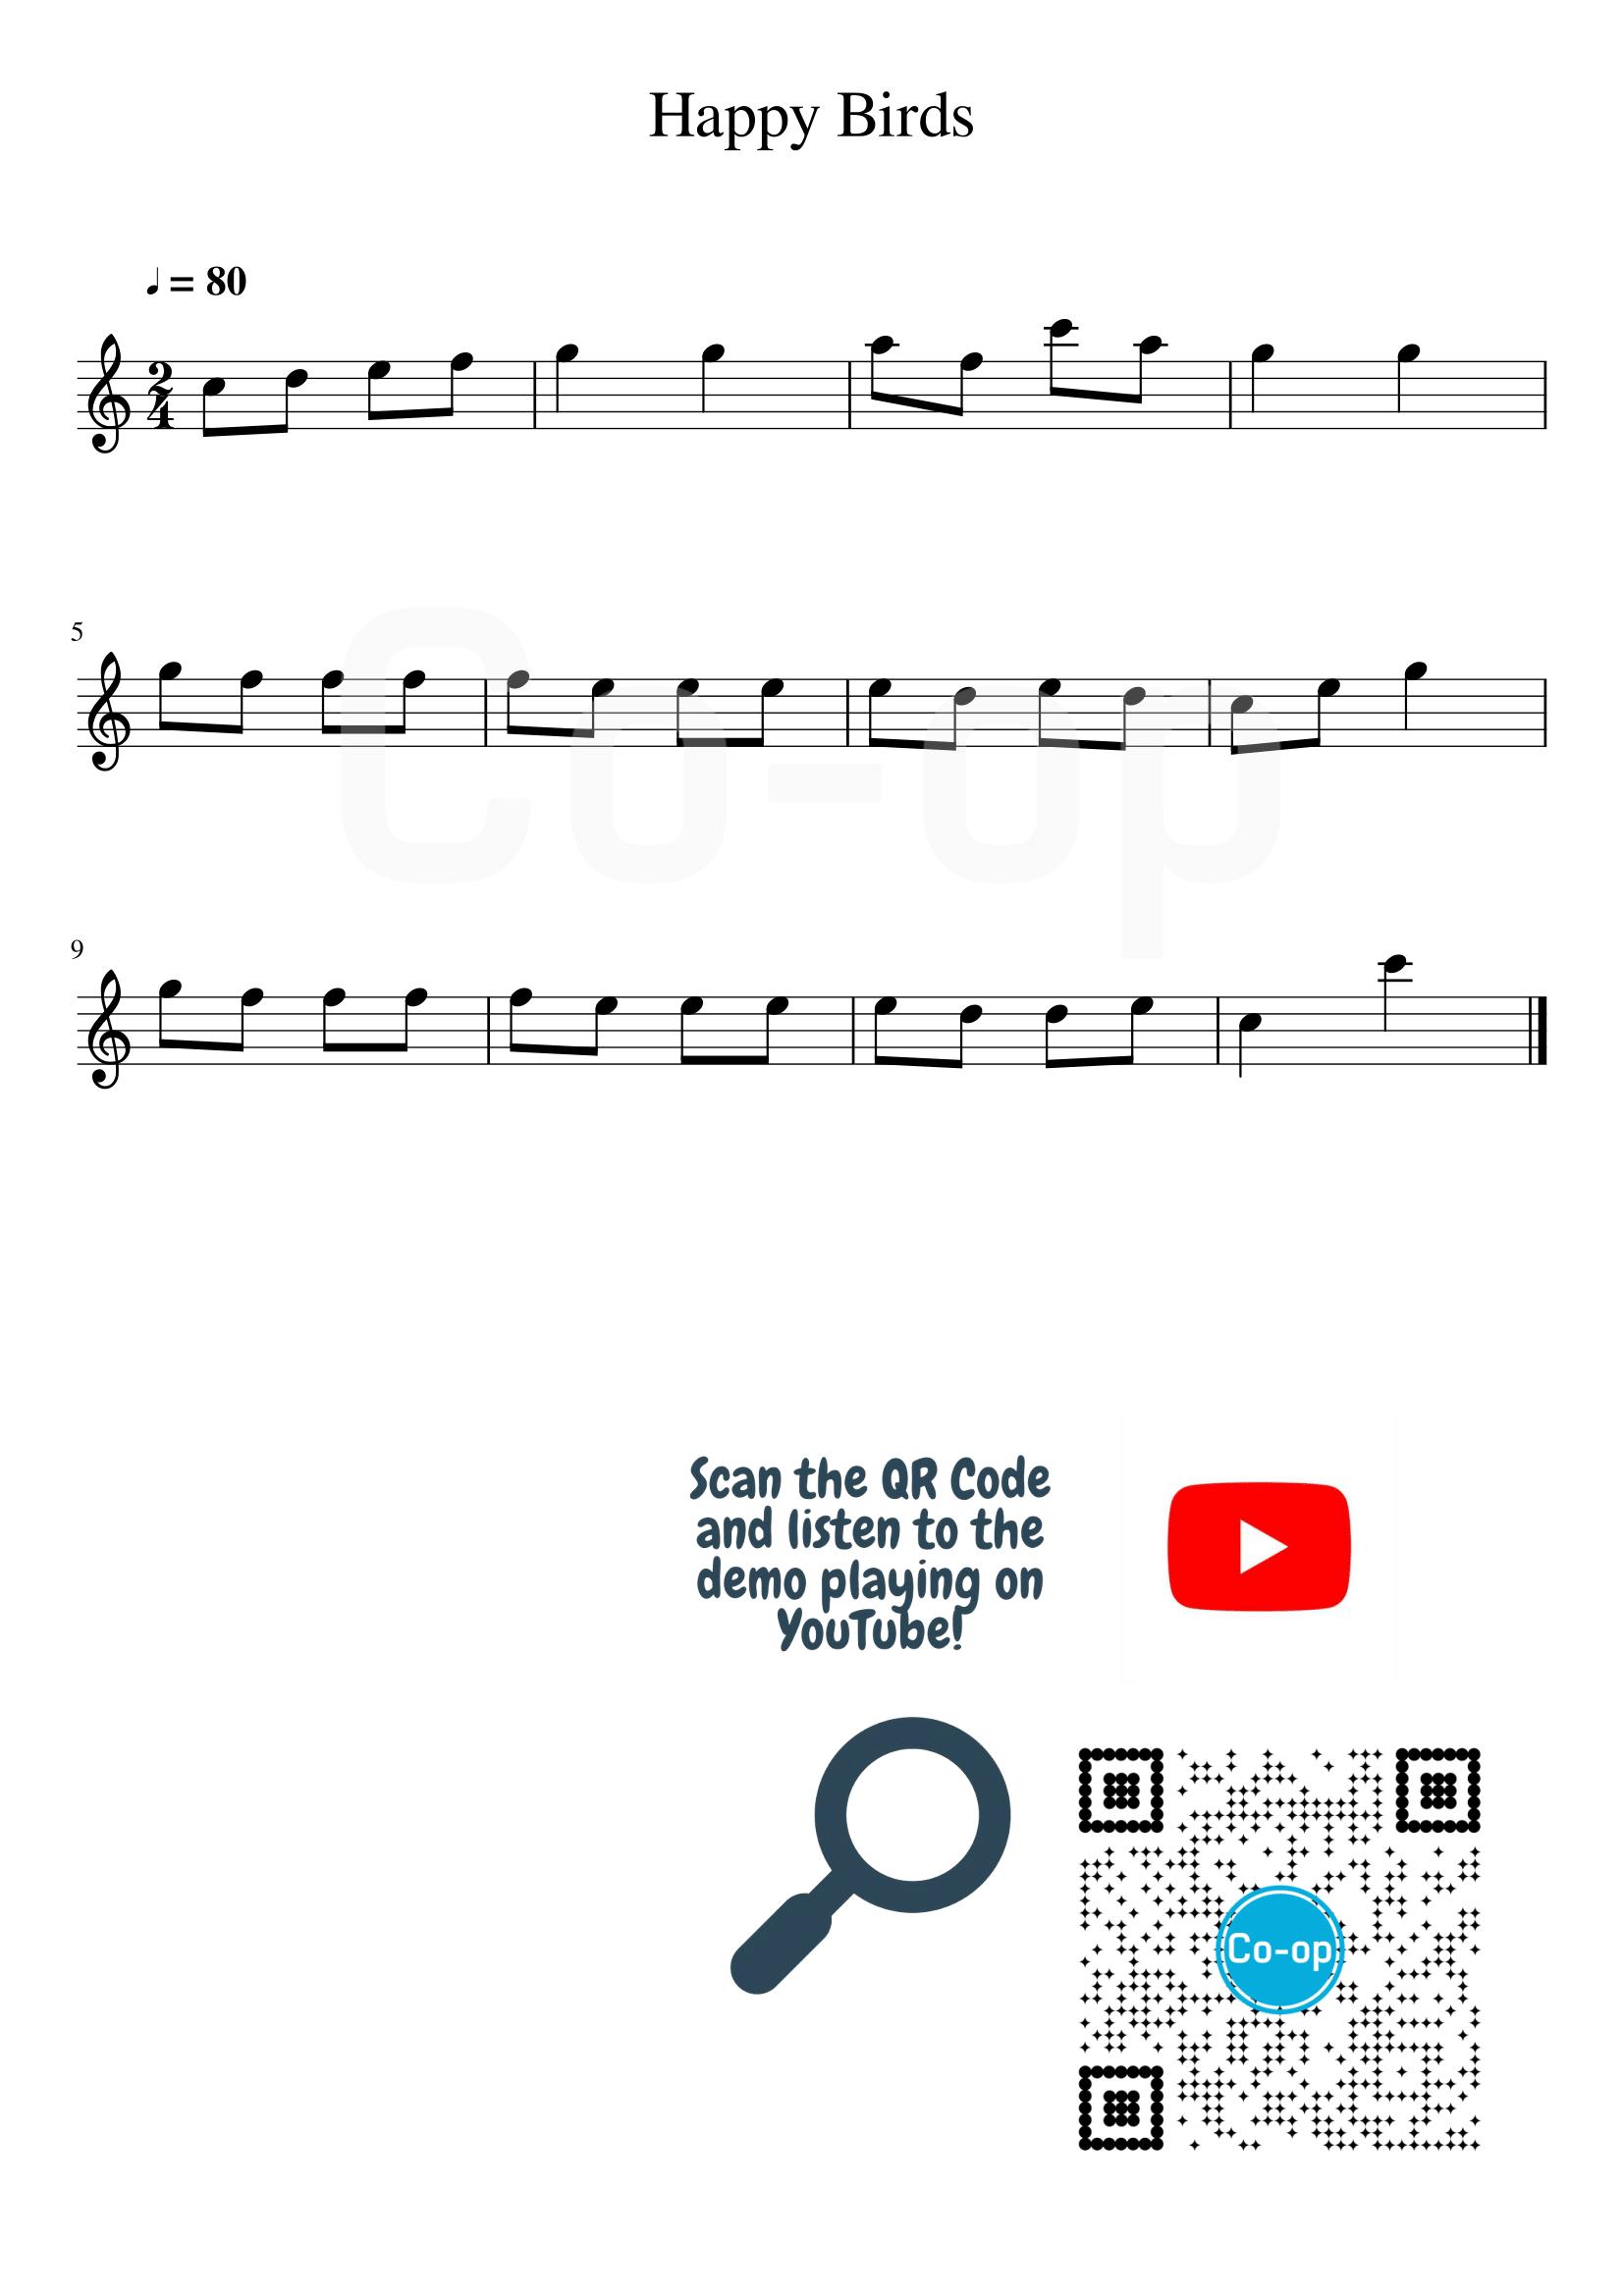 Happy Birds | Staff Notation | Free Sheet Music